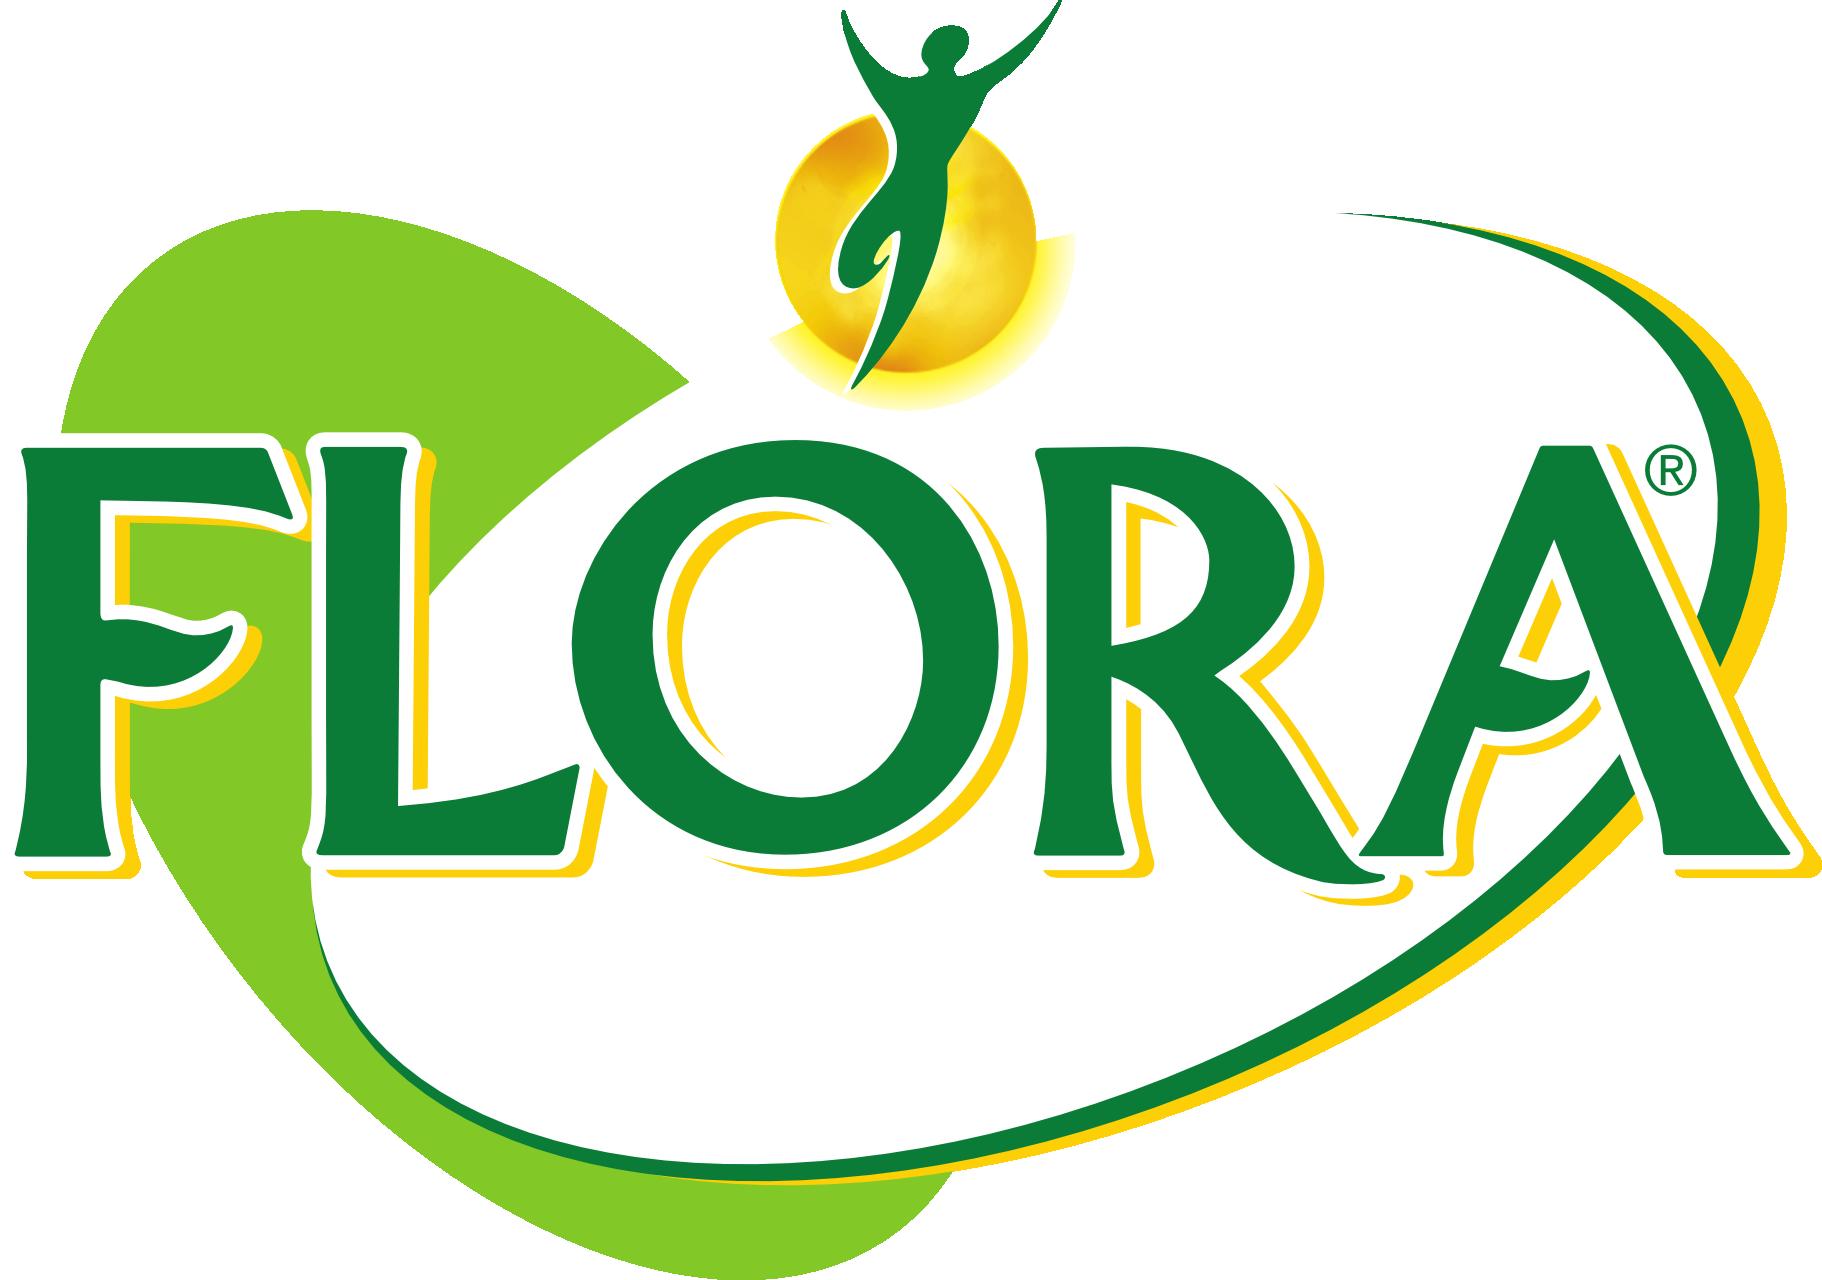 Flora (Australasia & Asia)